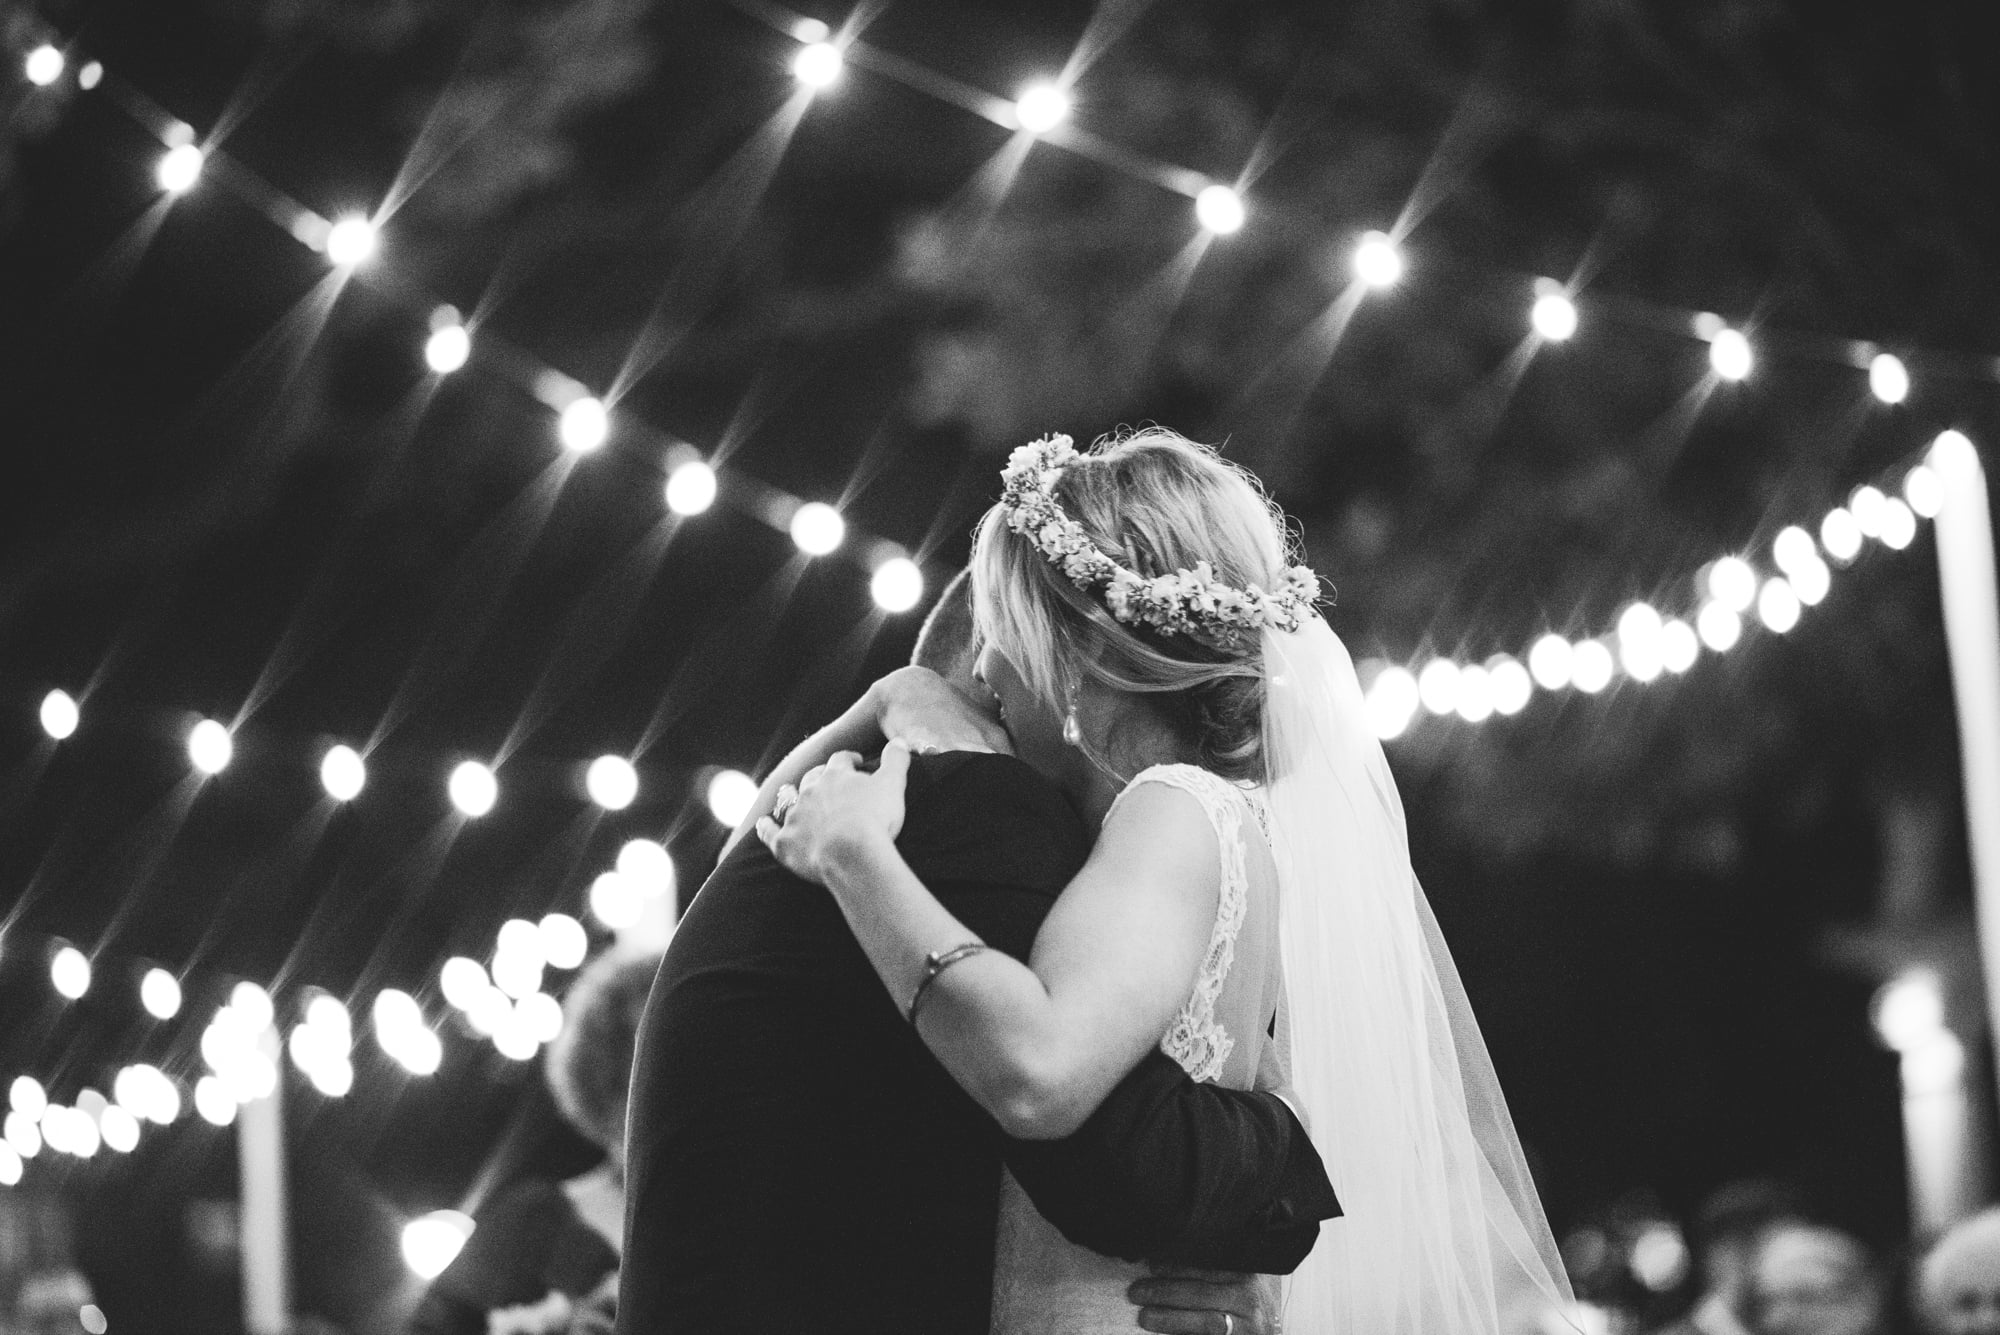 ©Isaiah & Taylor Photography - The Elms Mansion Wedding - New Orleans, Louisiana-75.jpg